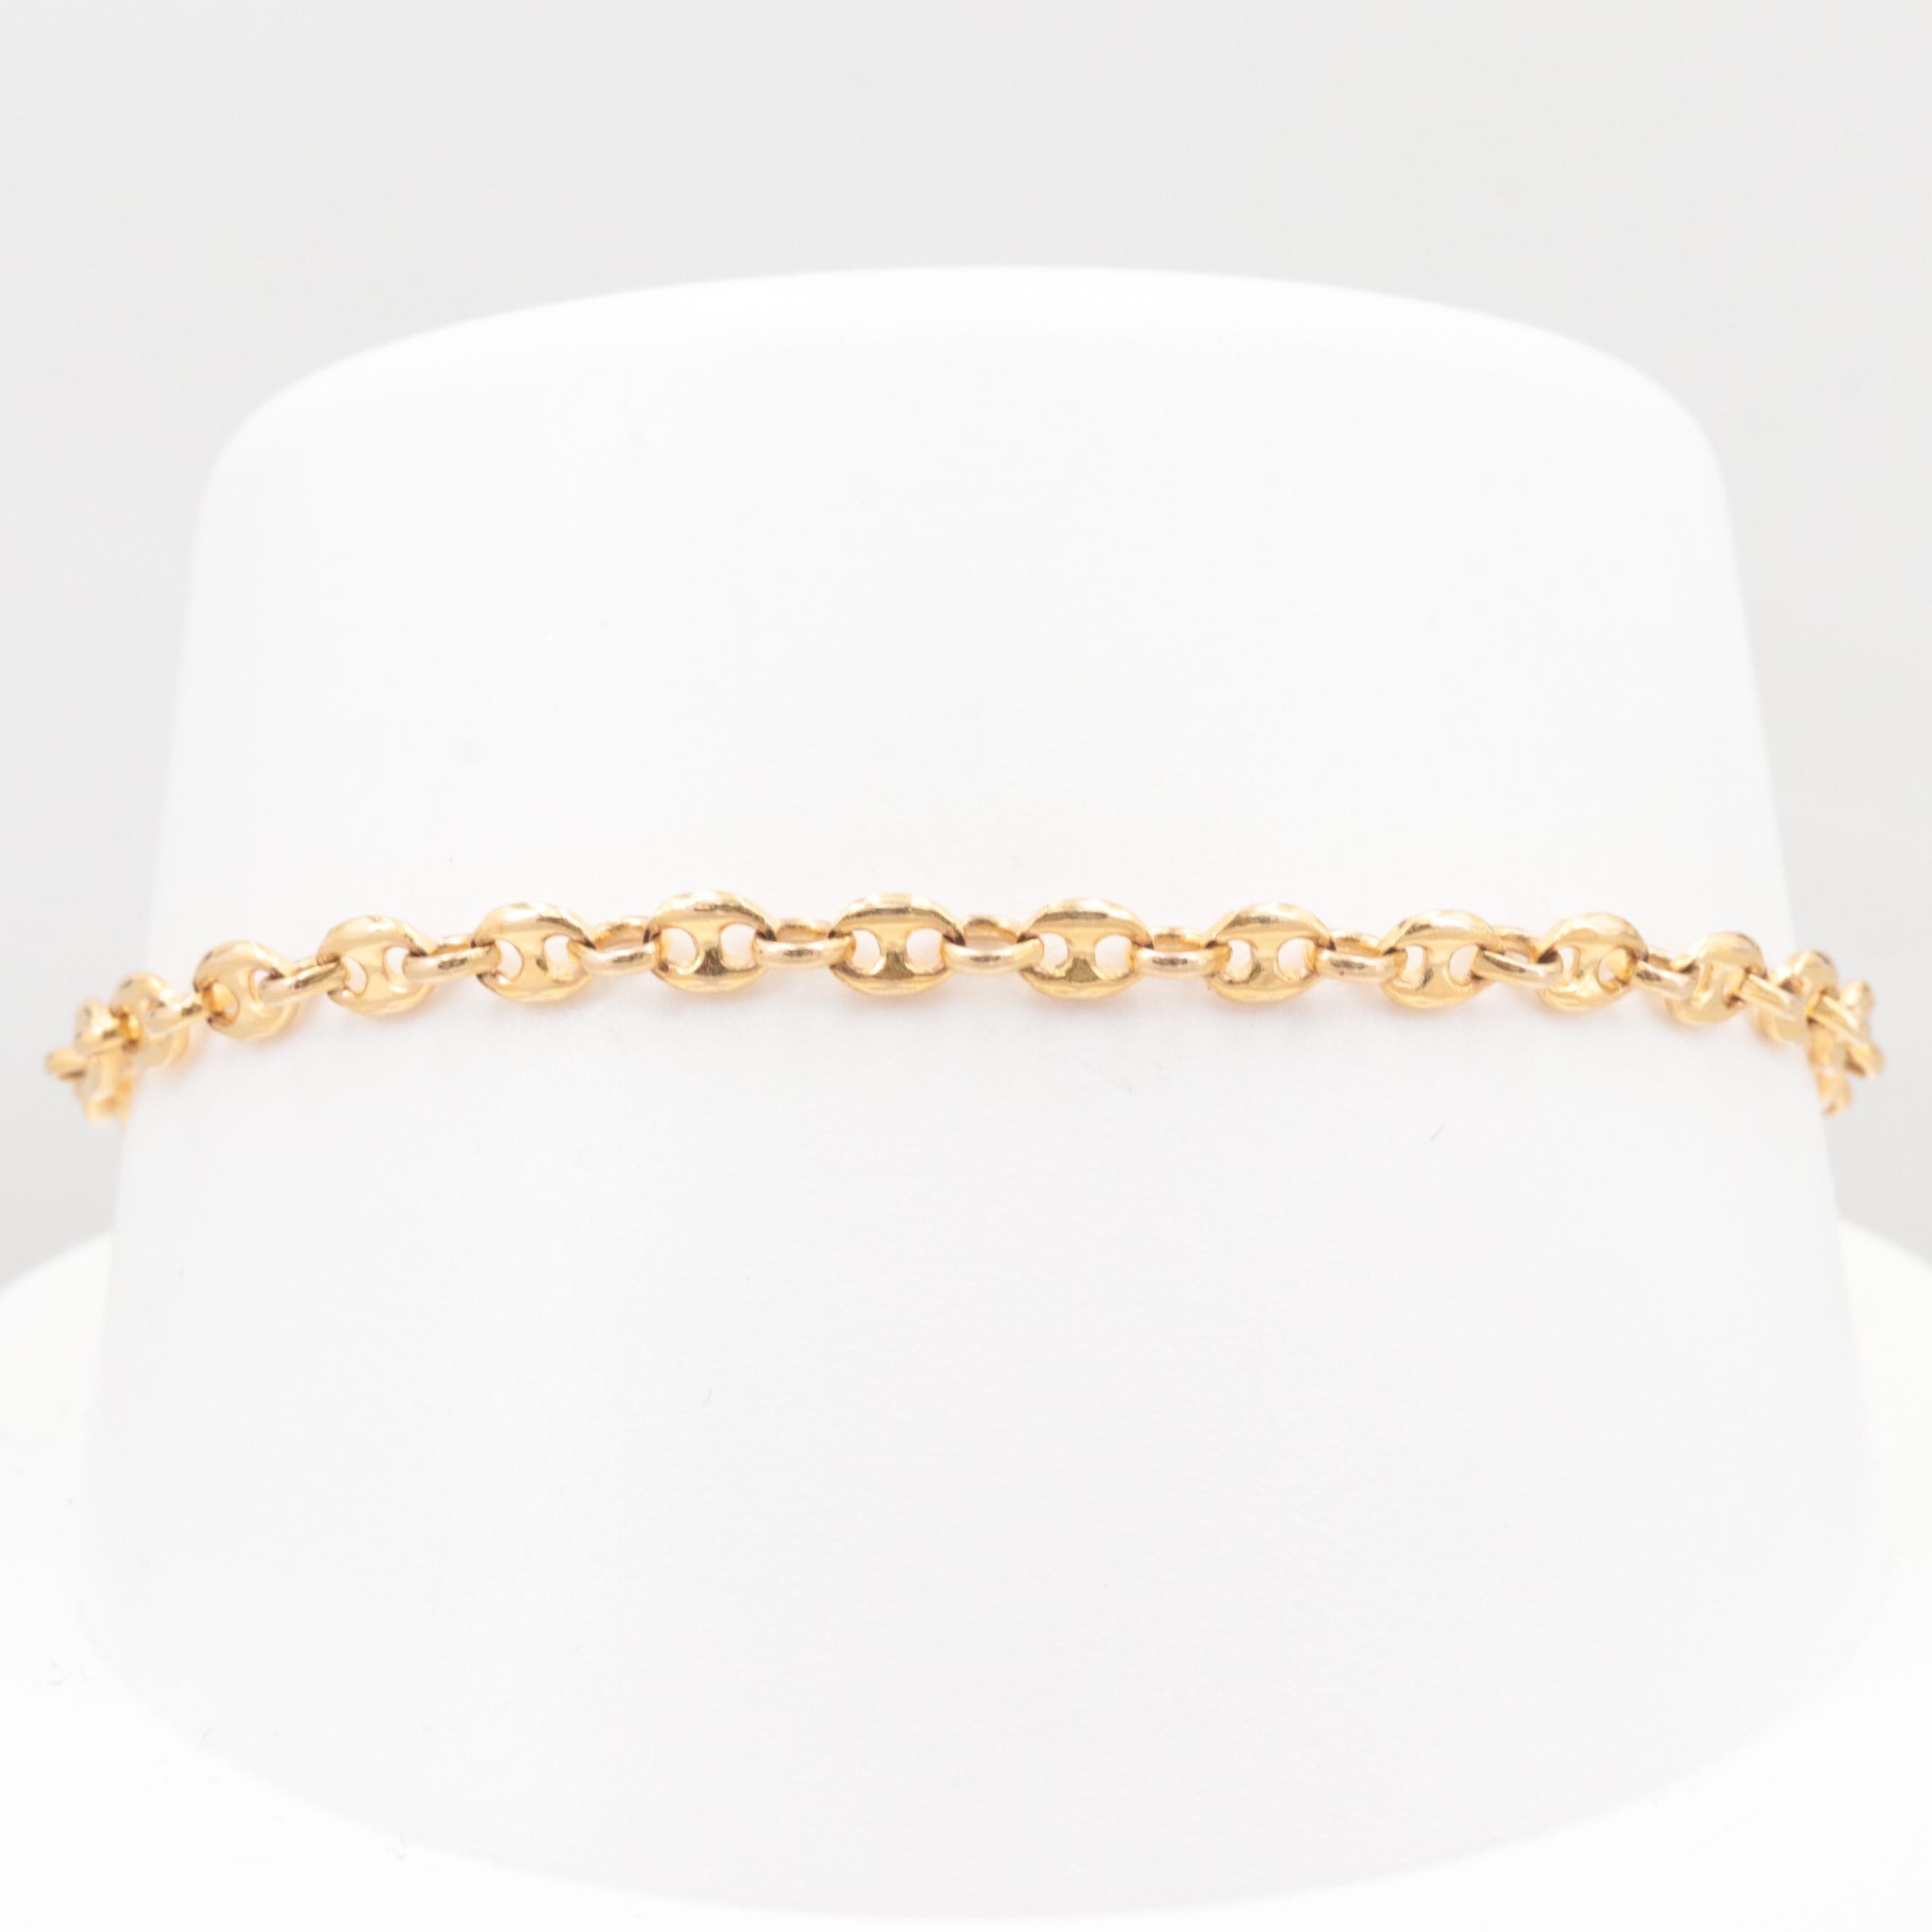 14K Yellow Gold Anchor Chain Bracelet